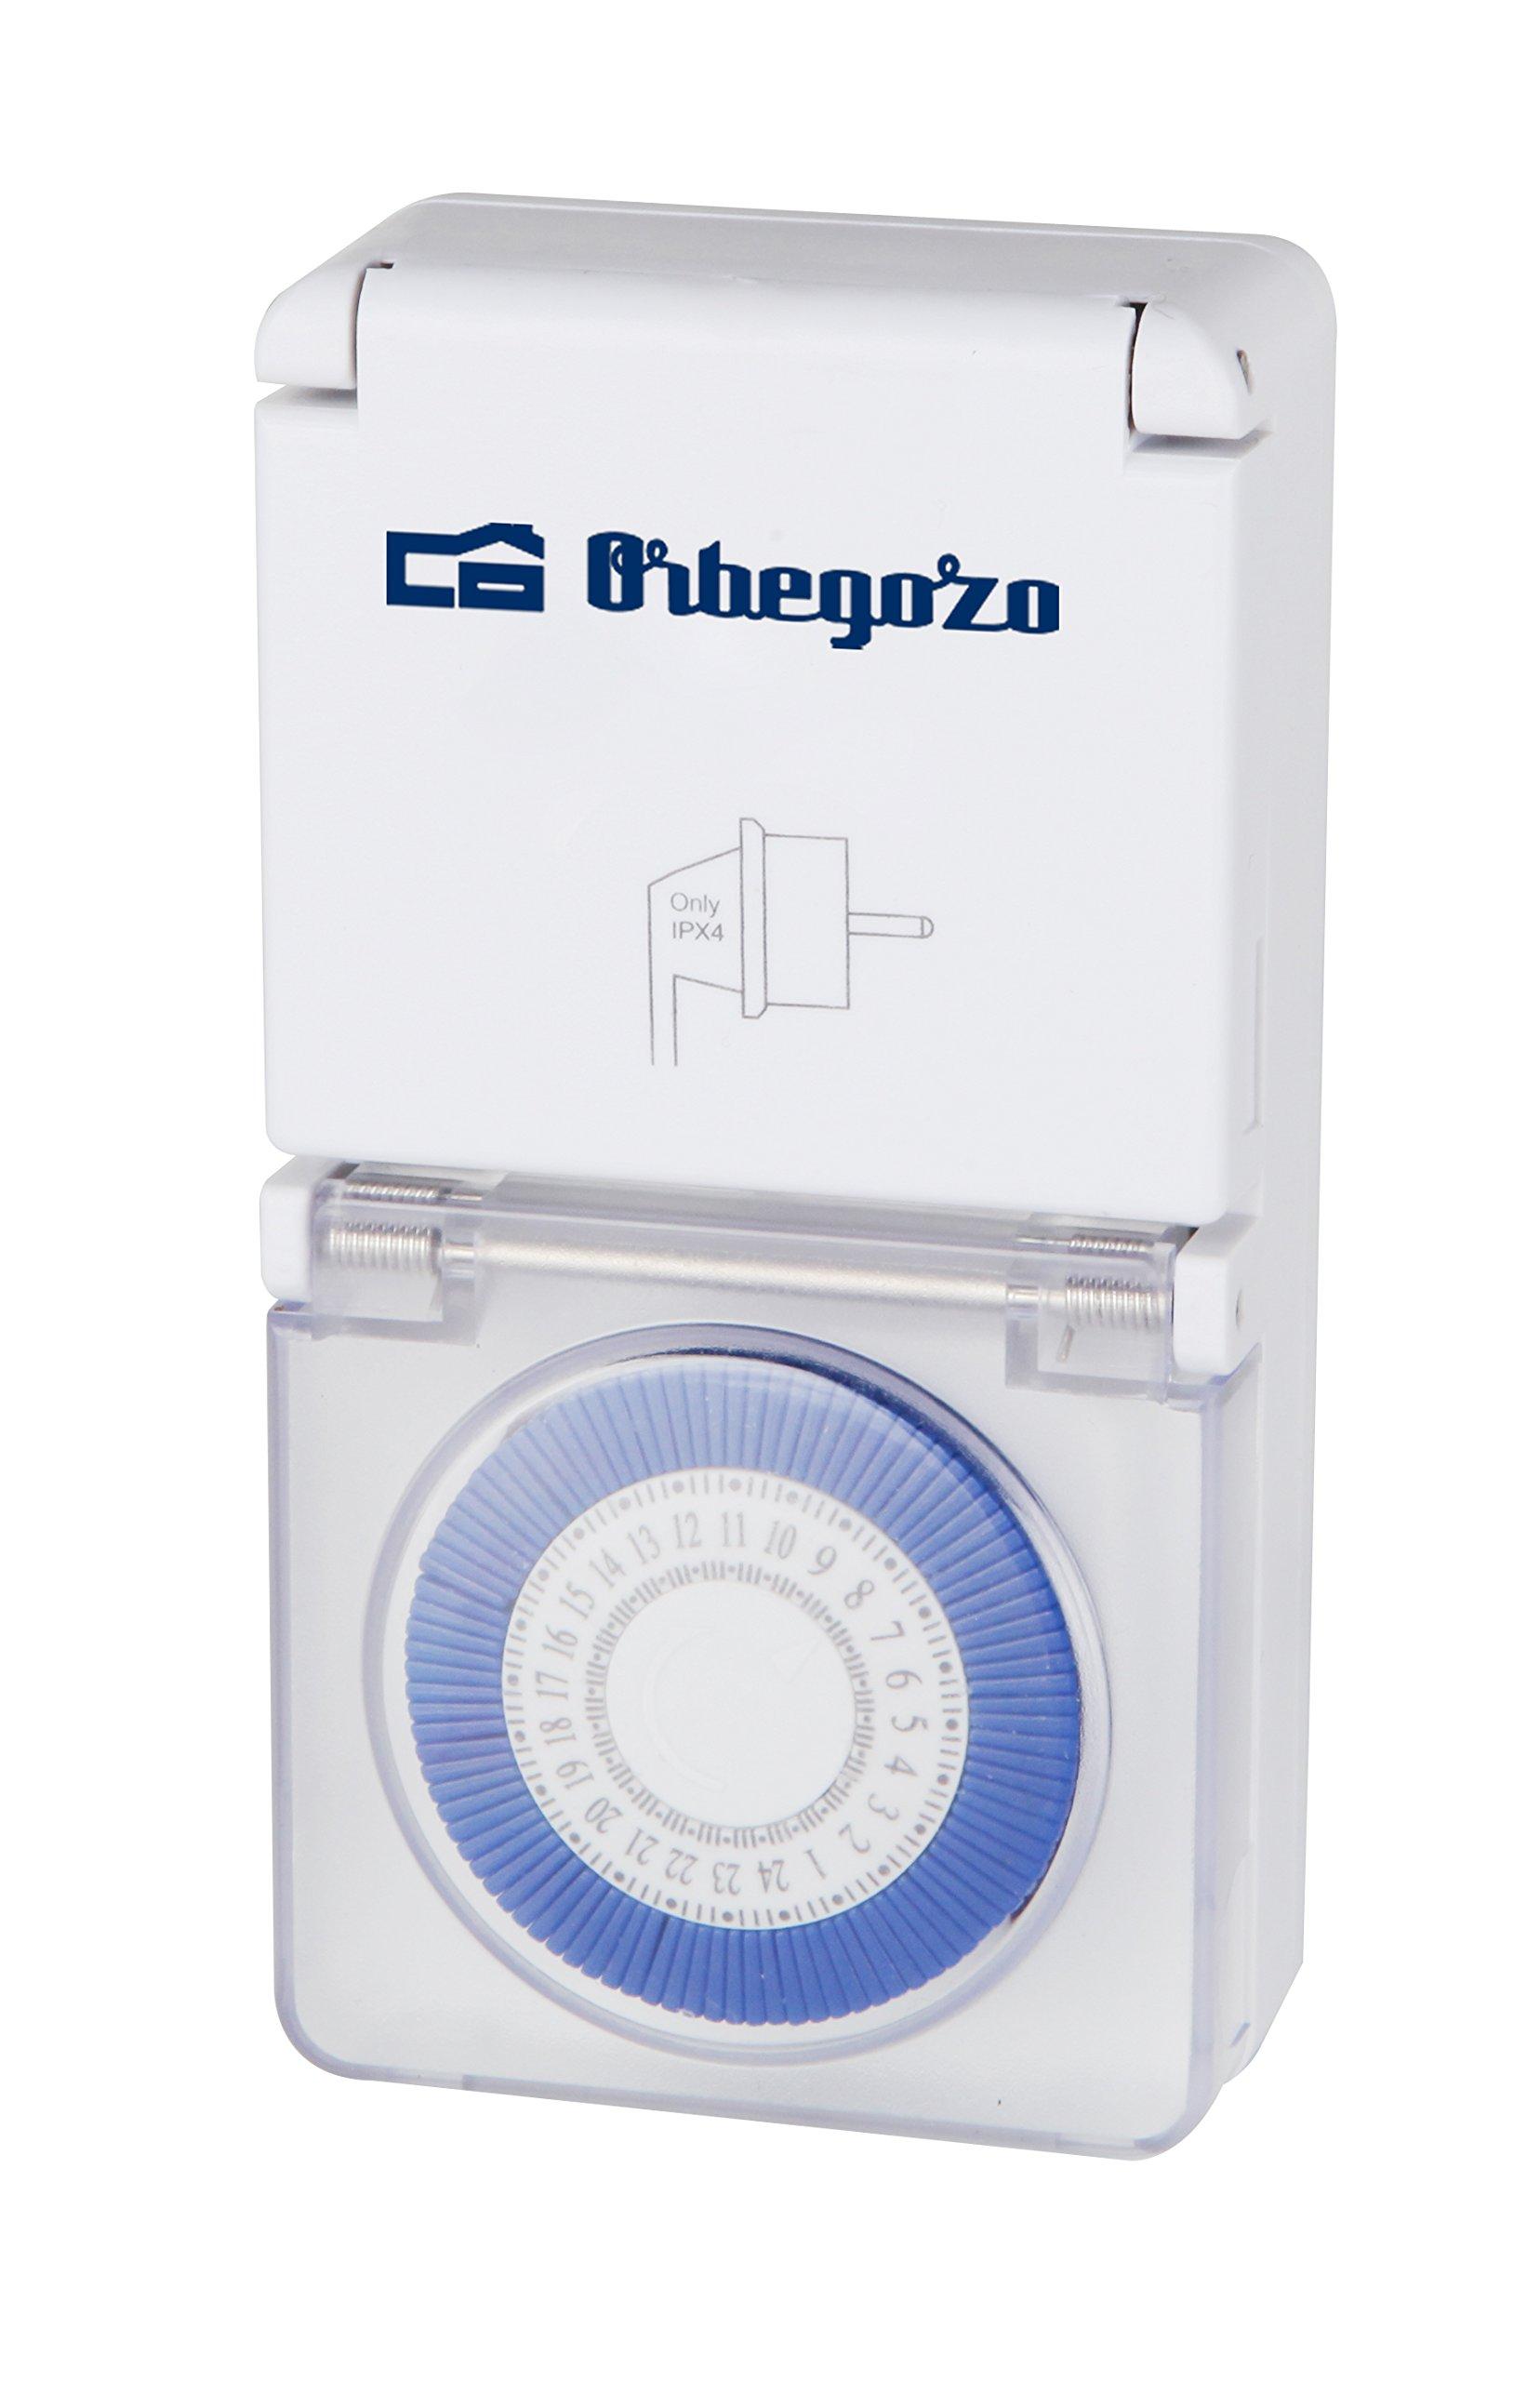 Orbegozo PG 10 – Programador eléctrico Exterior 24 Horas product image